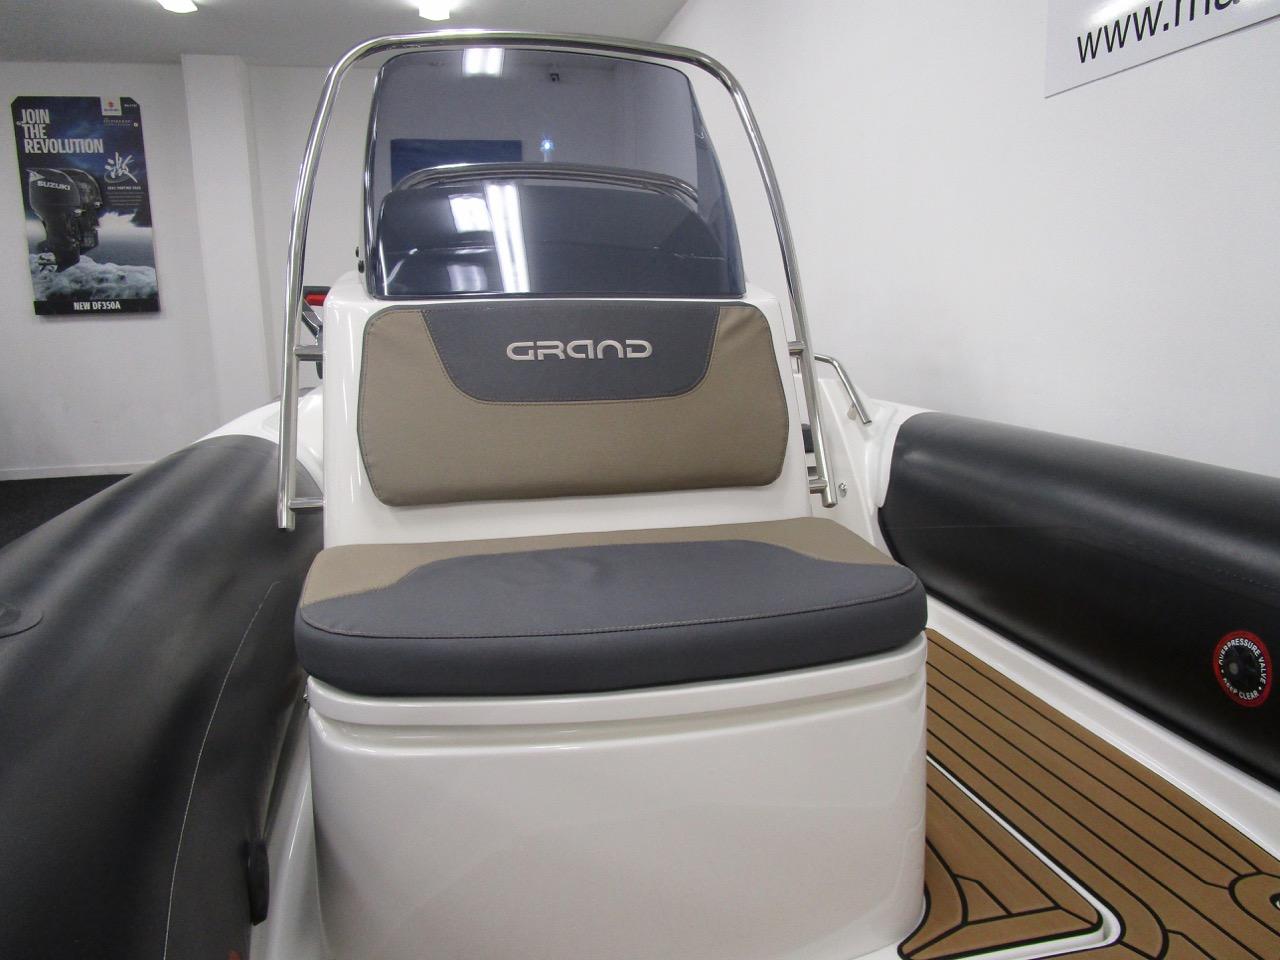 GRAND G500 RIB console front seat